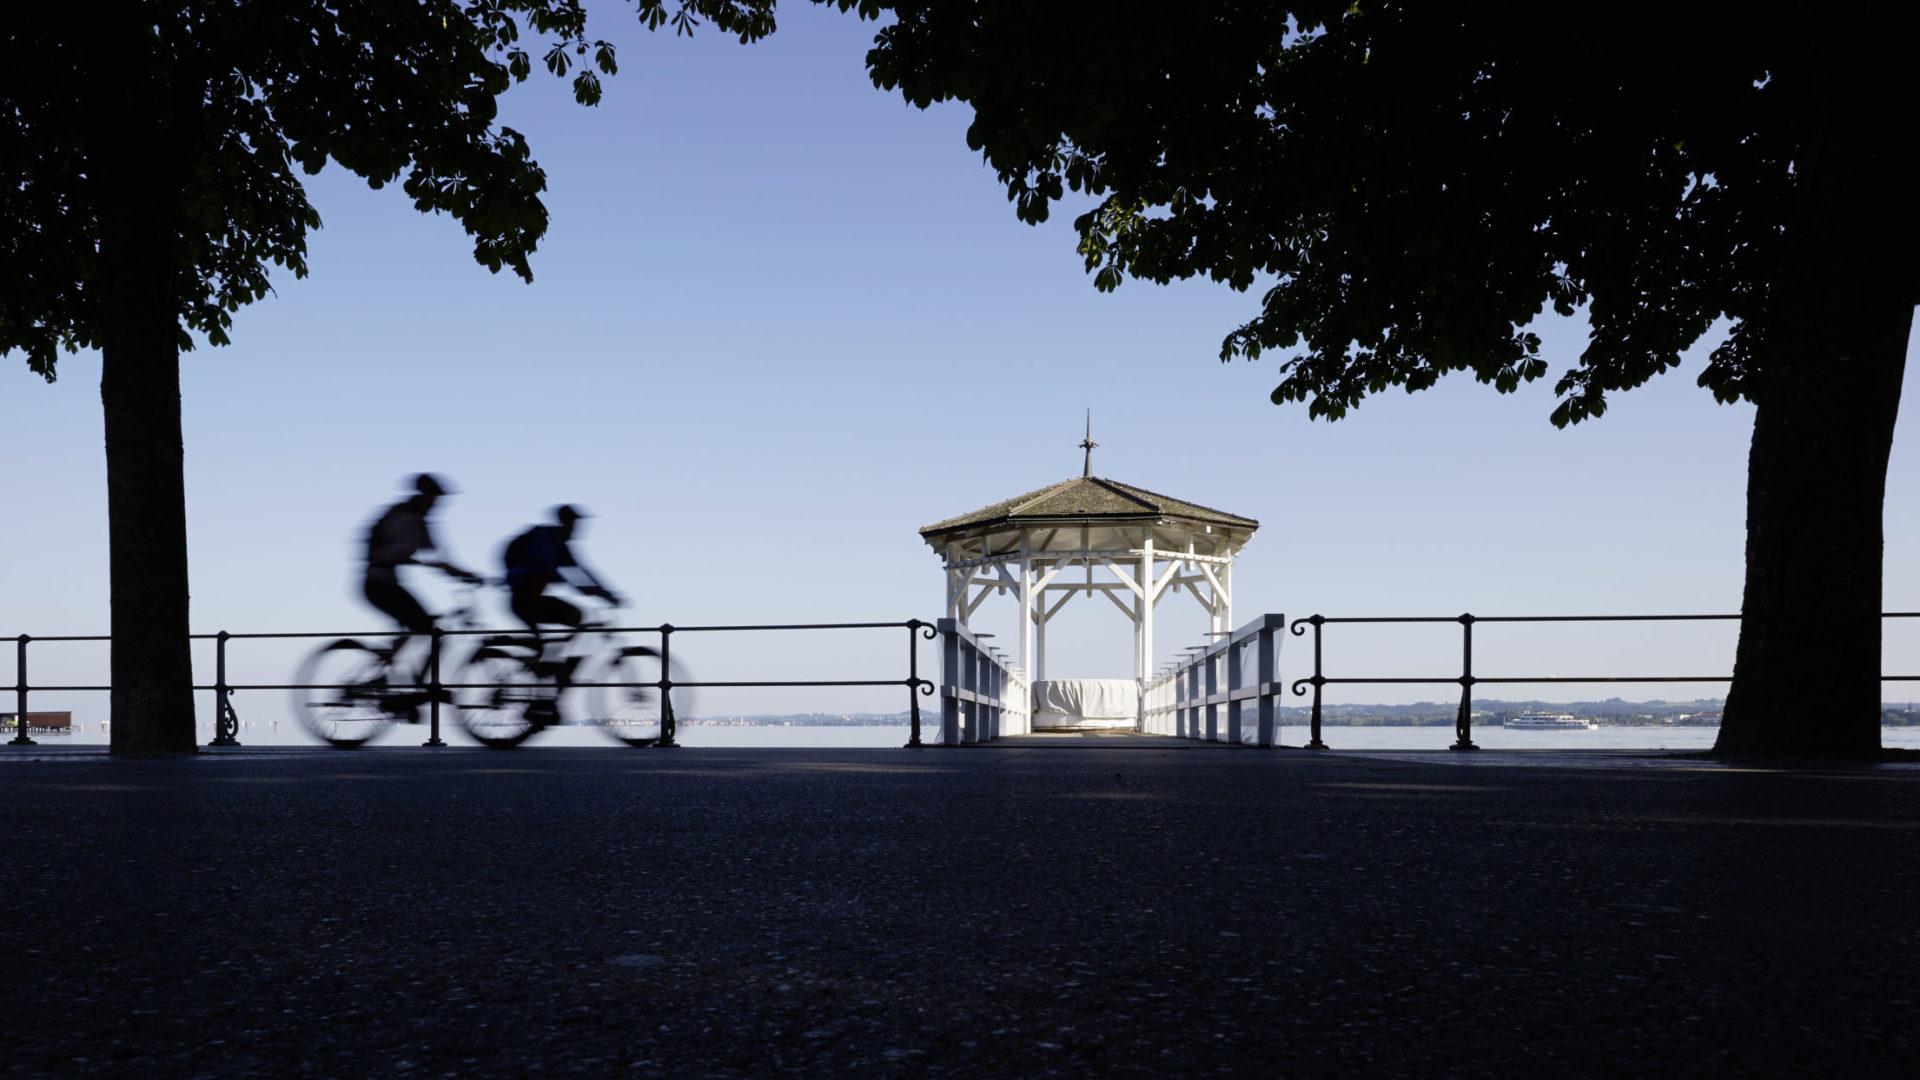 E-Bike Bregenz, am Bodensee (c) Peter Mathis / Vorarlberg Tourismus